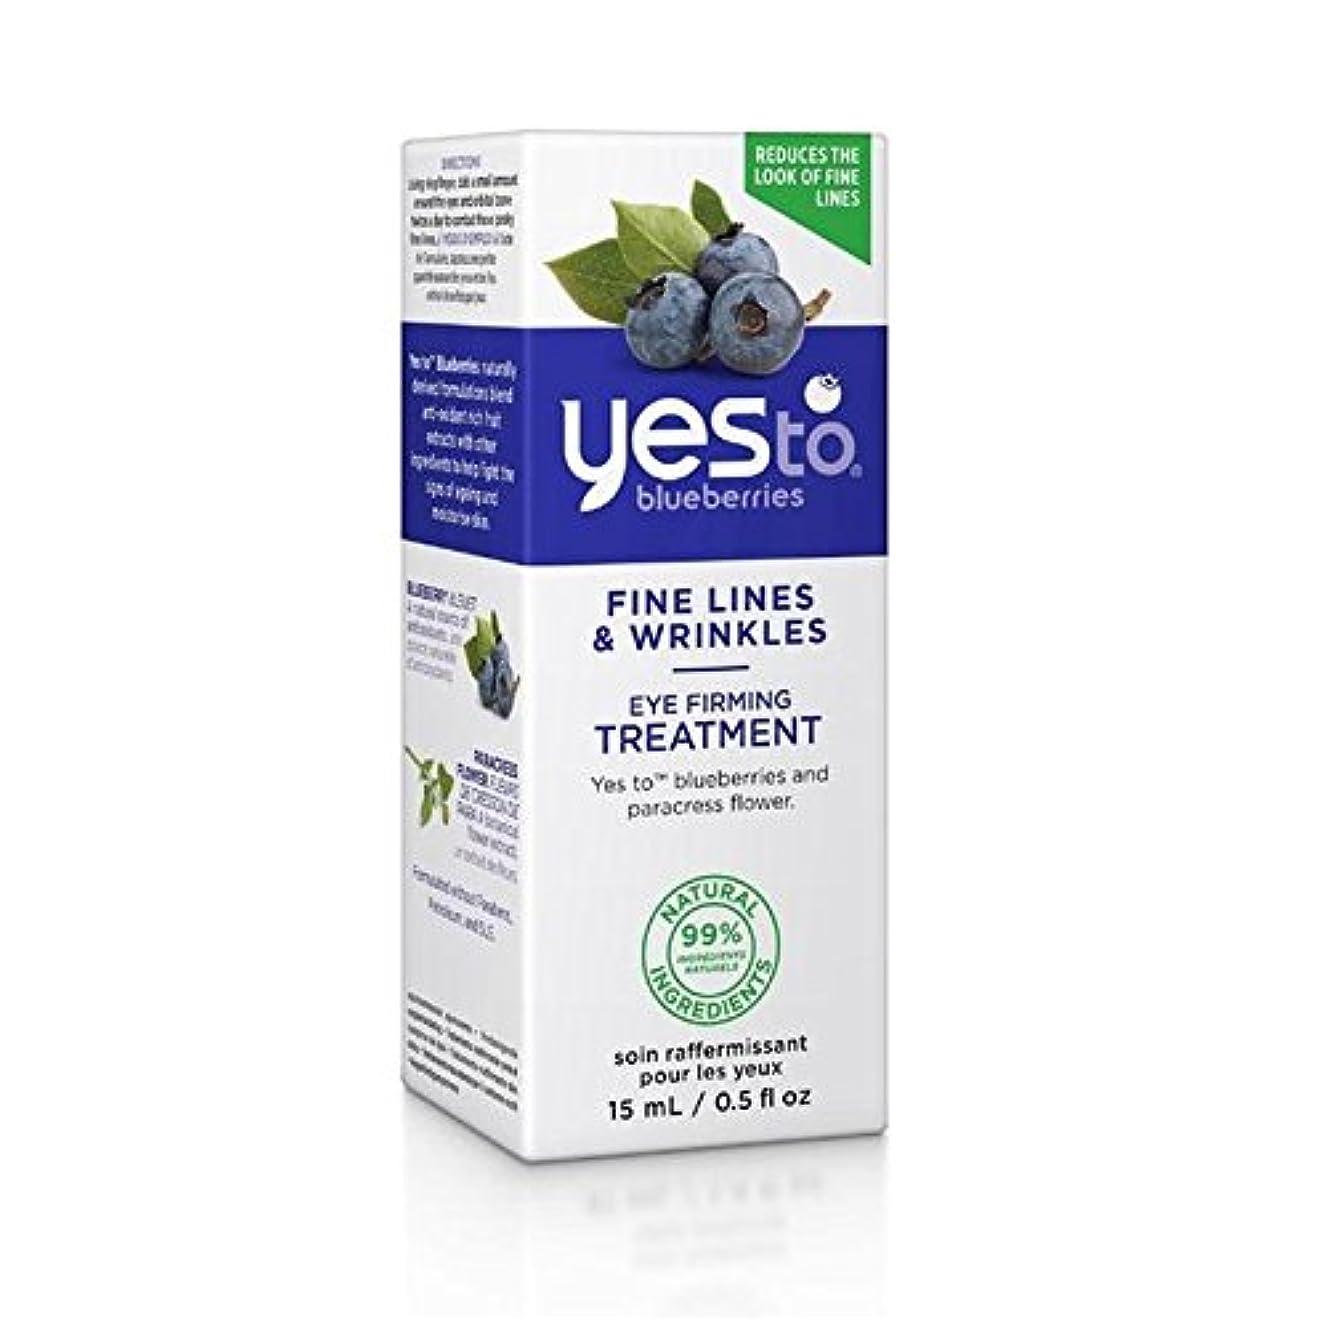 Yes to Blueberries Eye Cream 15ml - はいブルーベリーアイクリーム15ミリリットルへ [並行輸入品]